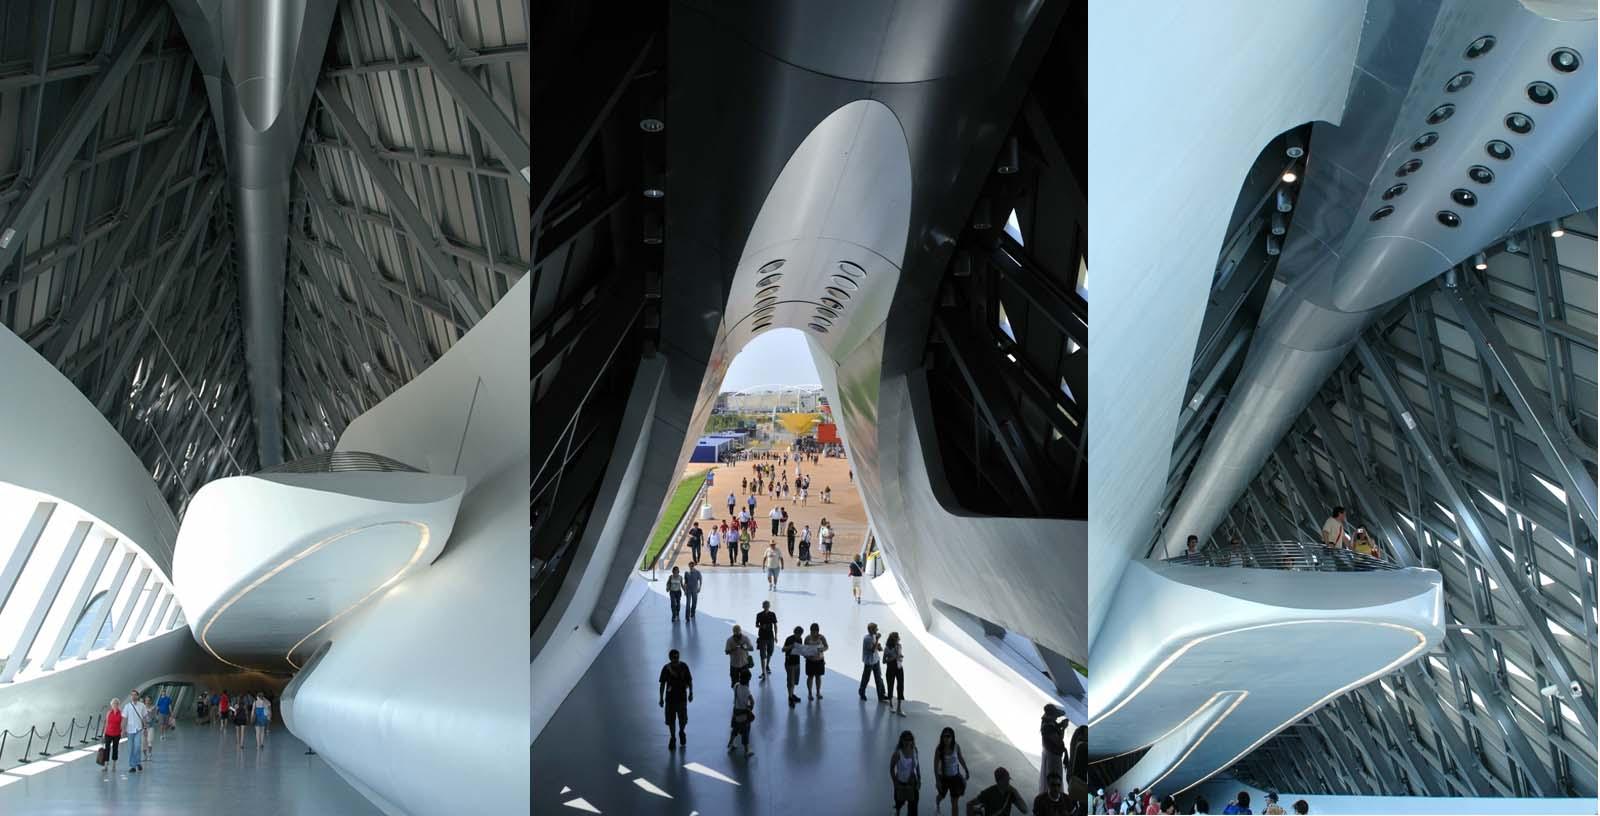 Zaha_Hadid_Bridge_Expo_Zaragoza_03_Building_Idom__Arno_Klinkhamer_-_Heinz_Hebeisen_-_www.photaki.es